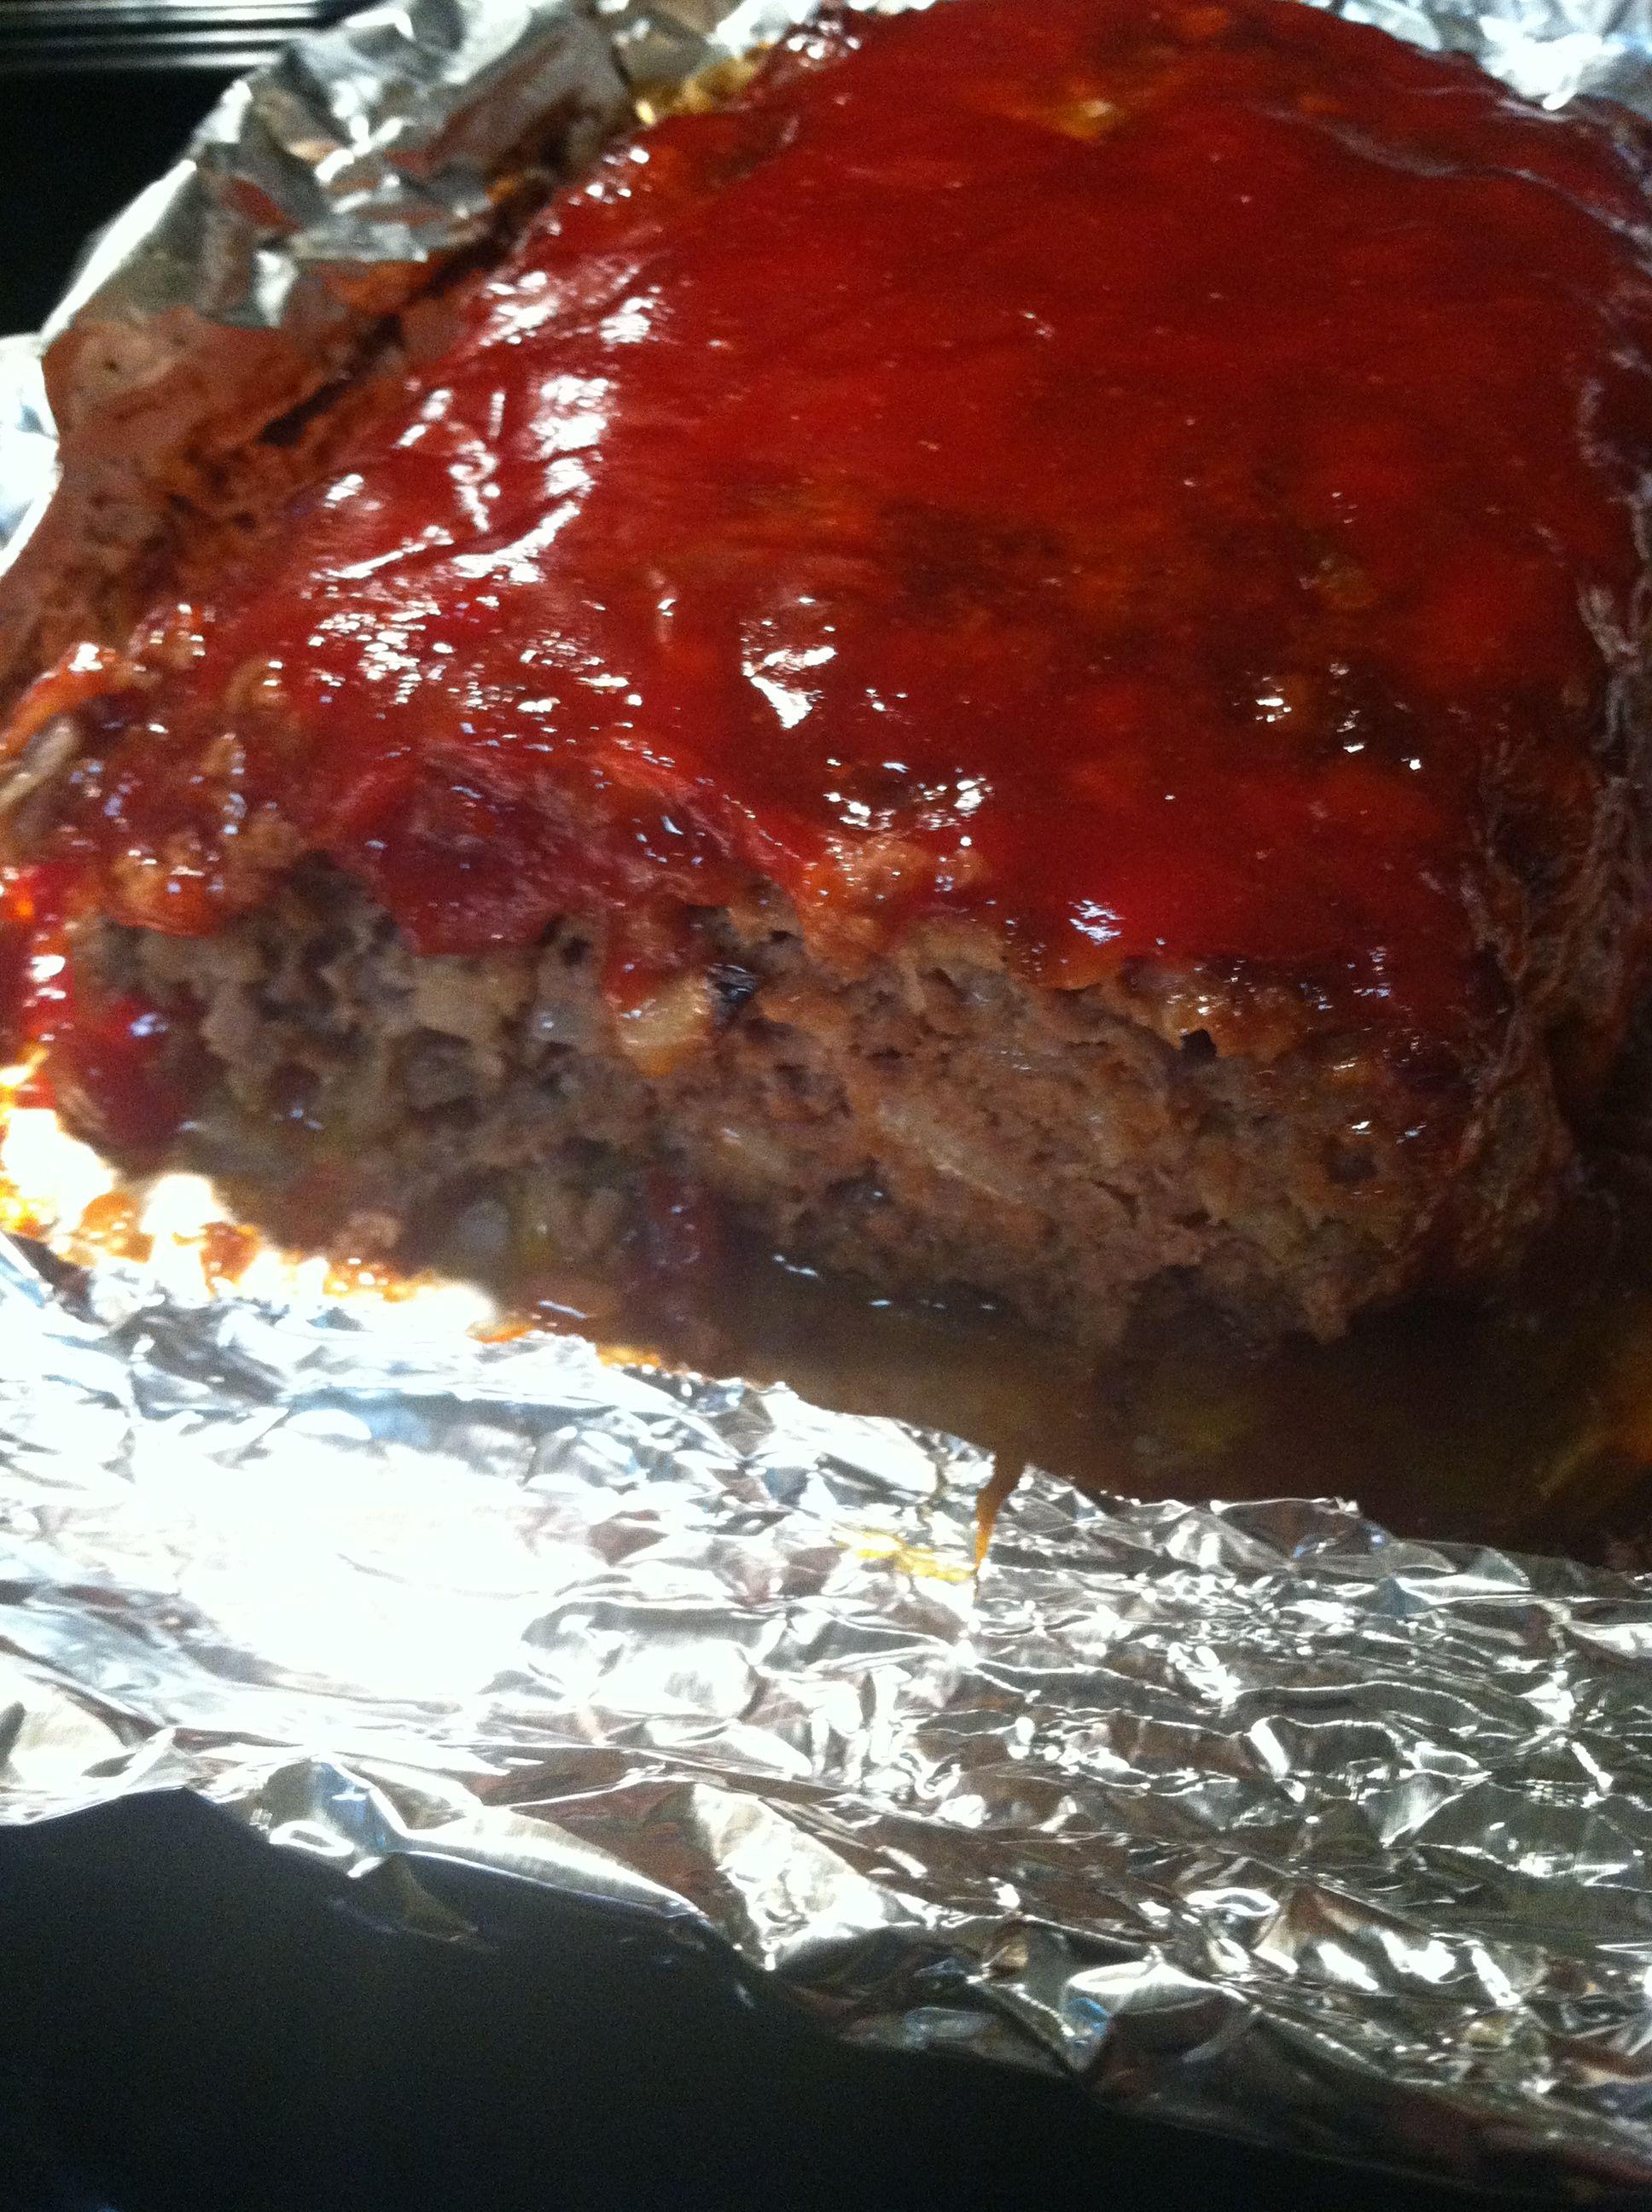 Christmas Meatloaf.Elvis Presley Loved This Meatloaf And Served It For